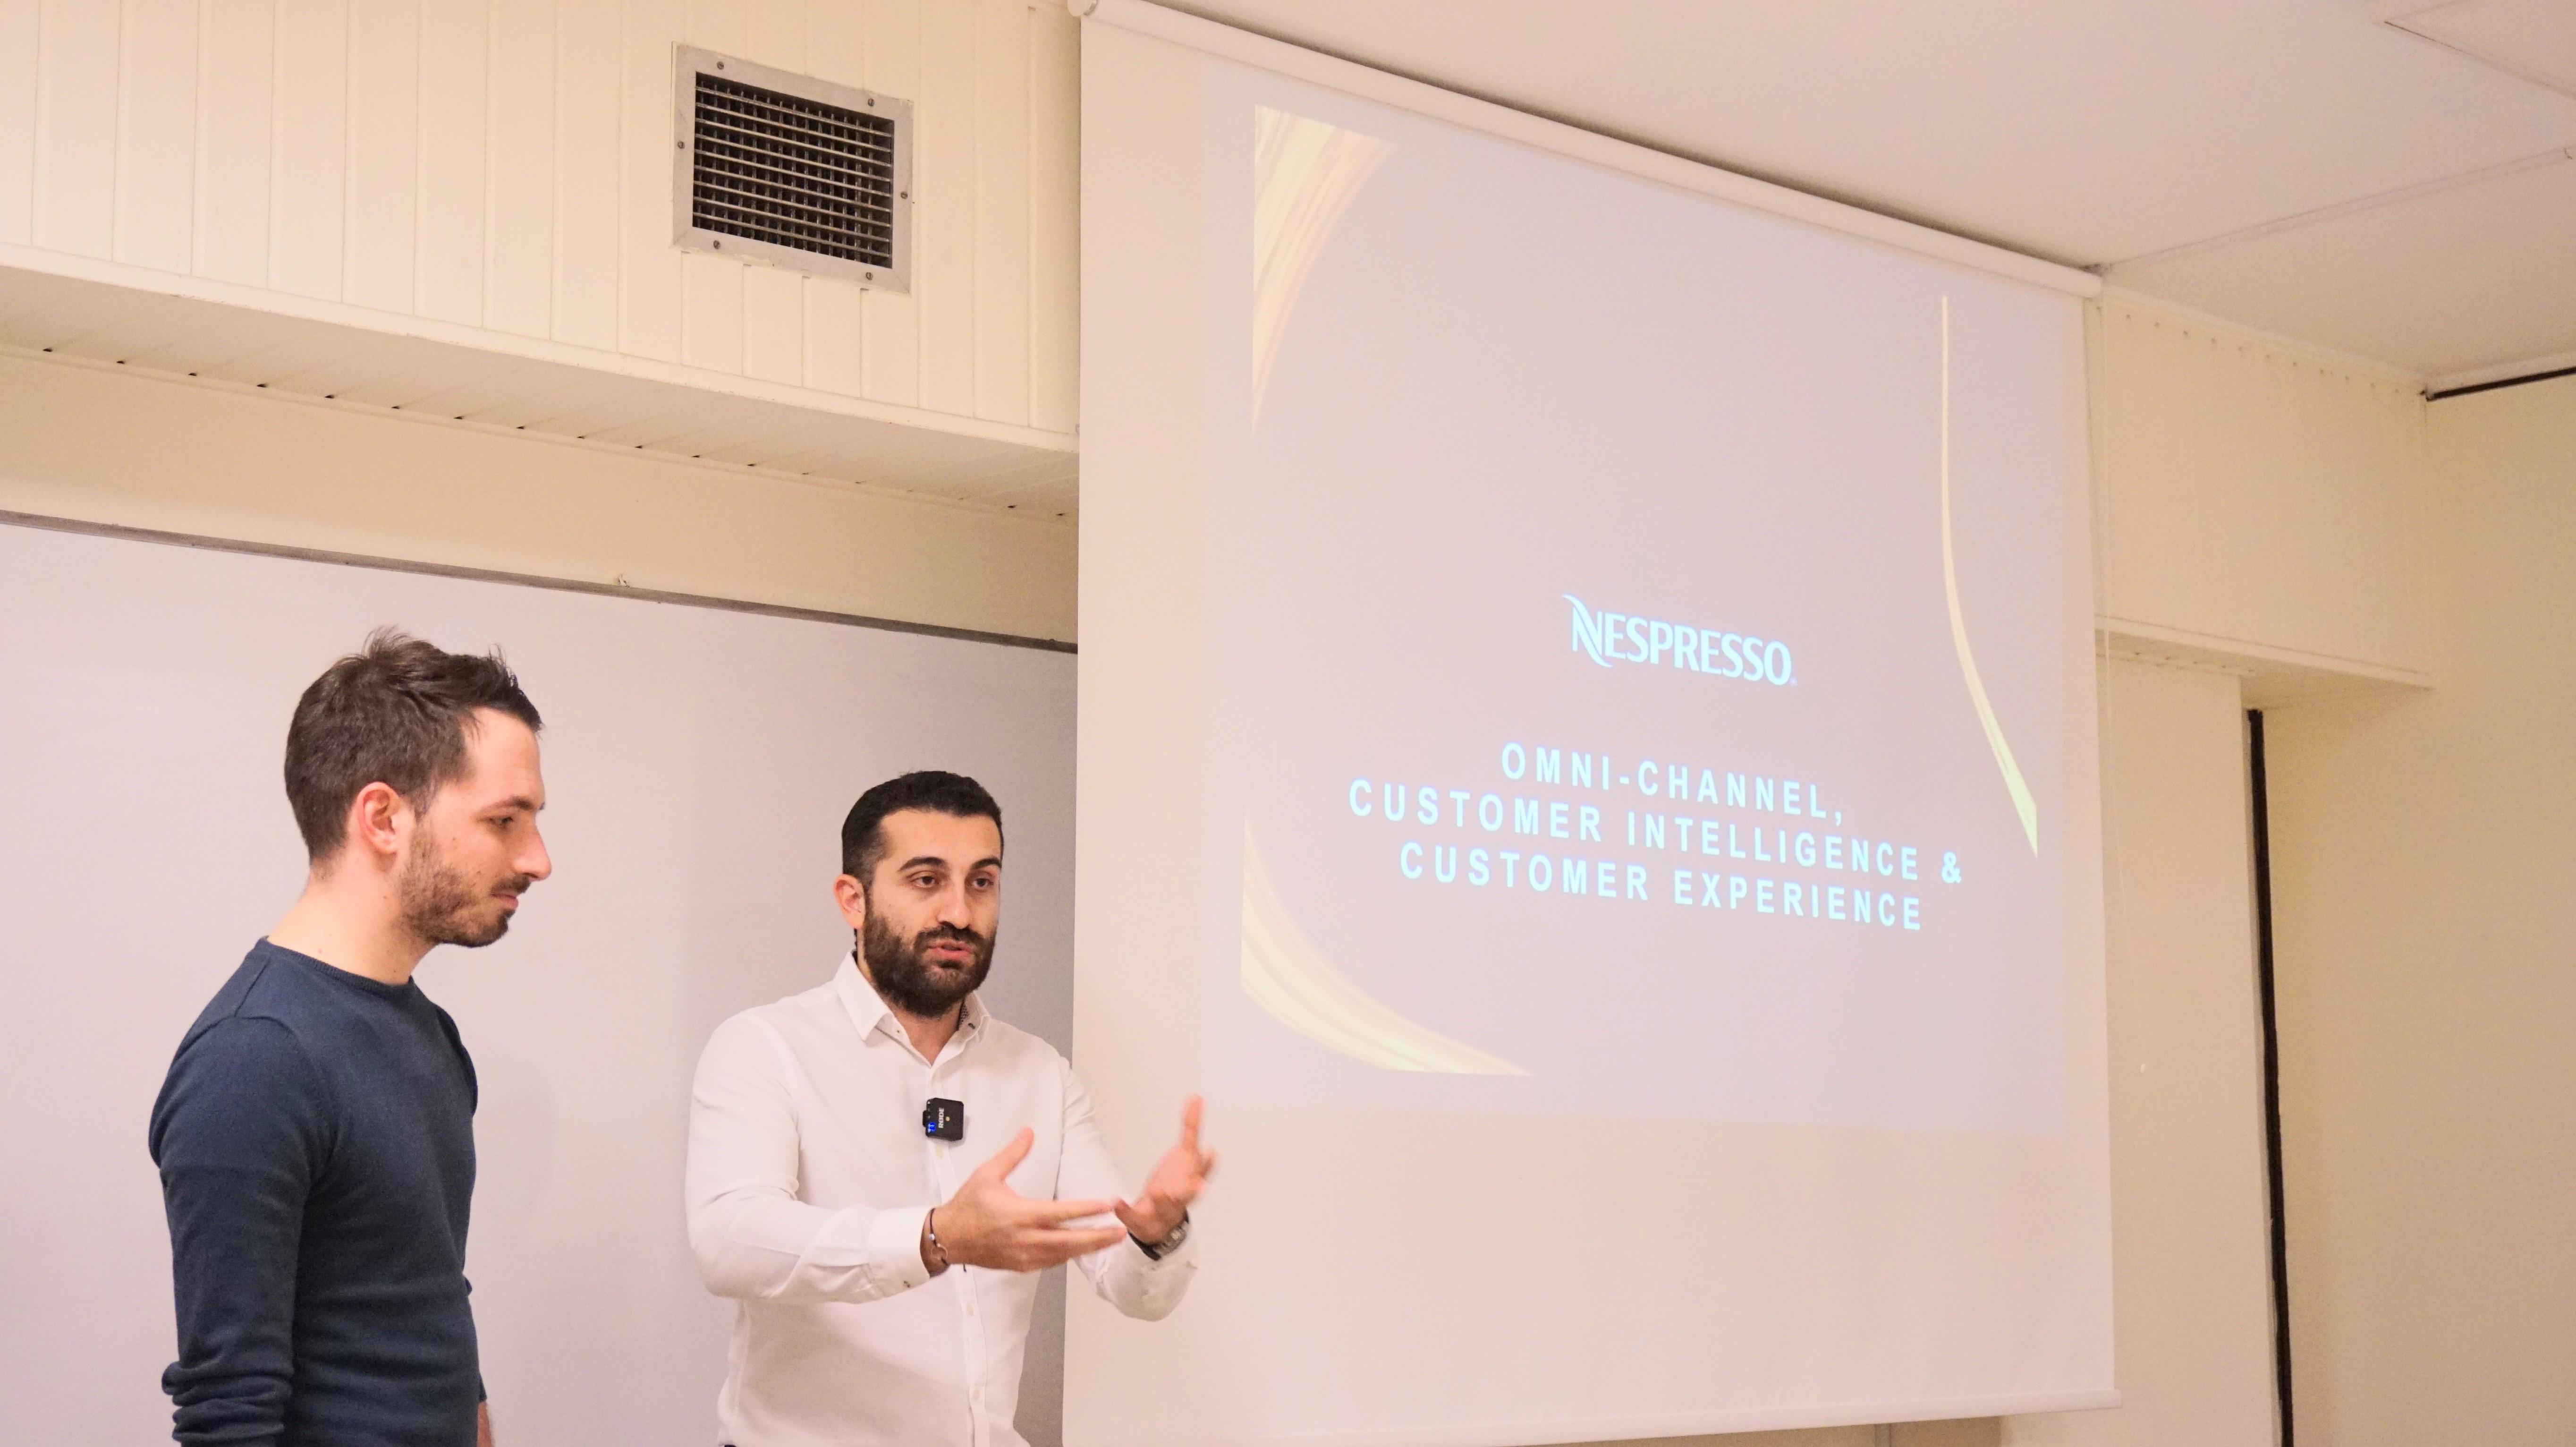 Nespresson Omnichannel strategy presentation